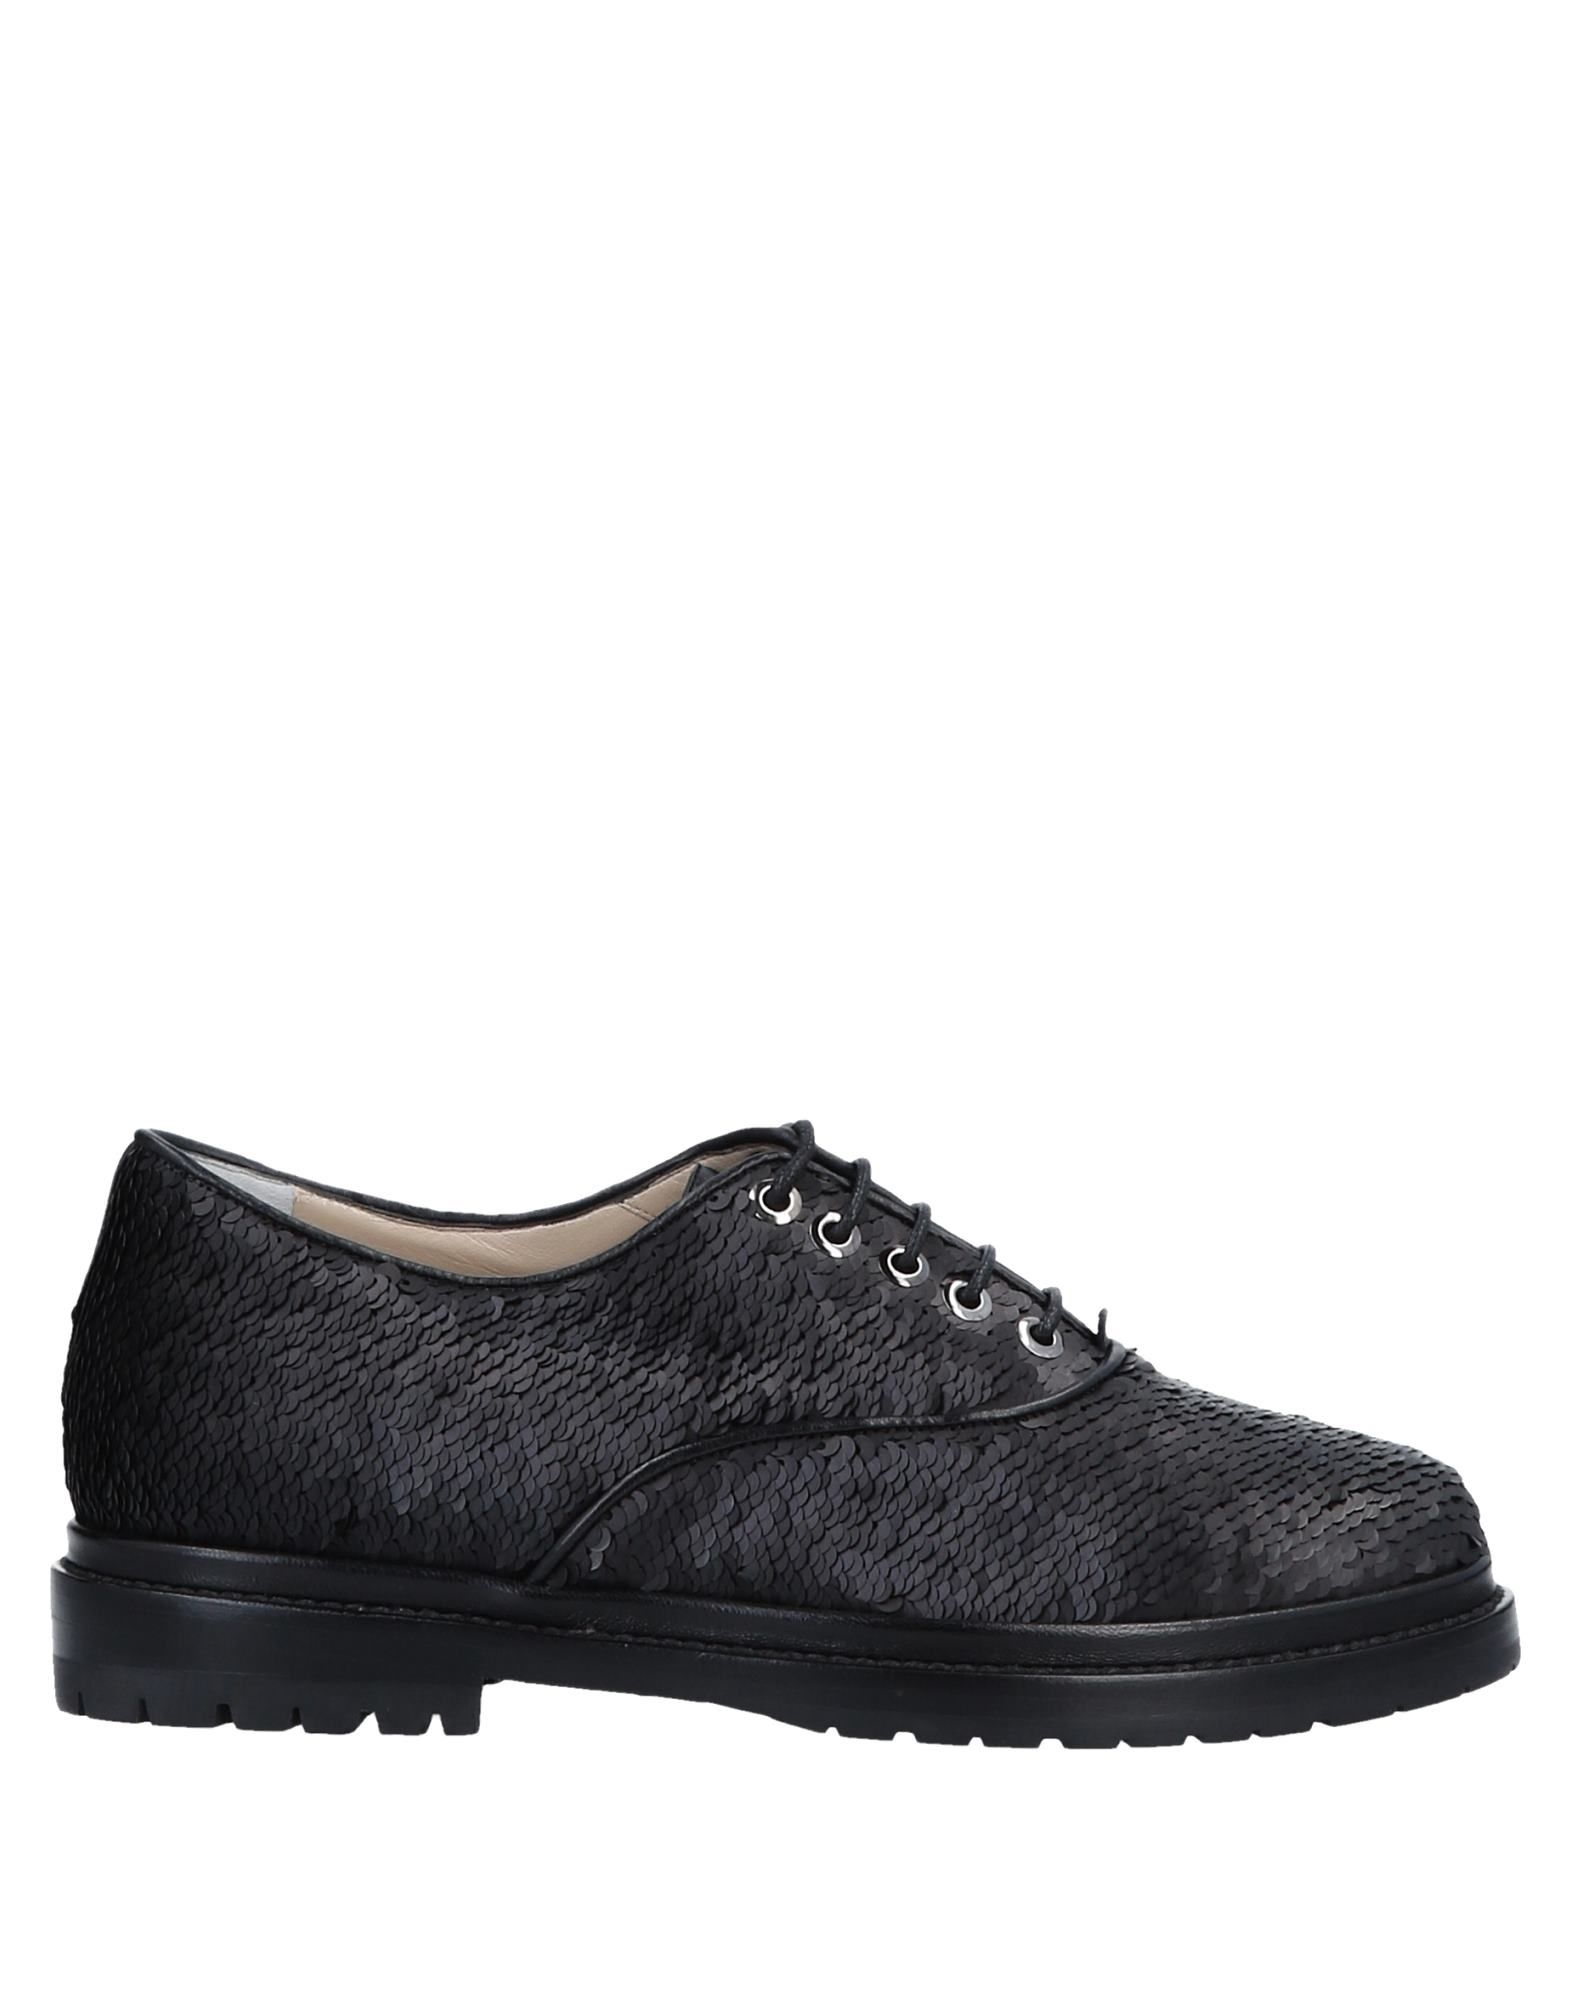 RODO Обувь на шнурках первый внутри обувь обувь обувь обувь обувь обувь обувь обувь обувь 8a2549 мужская армия green 40 метров